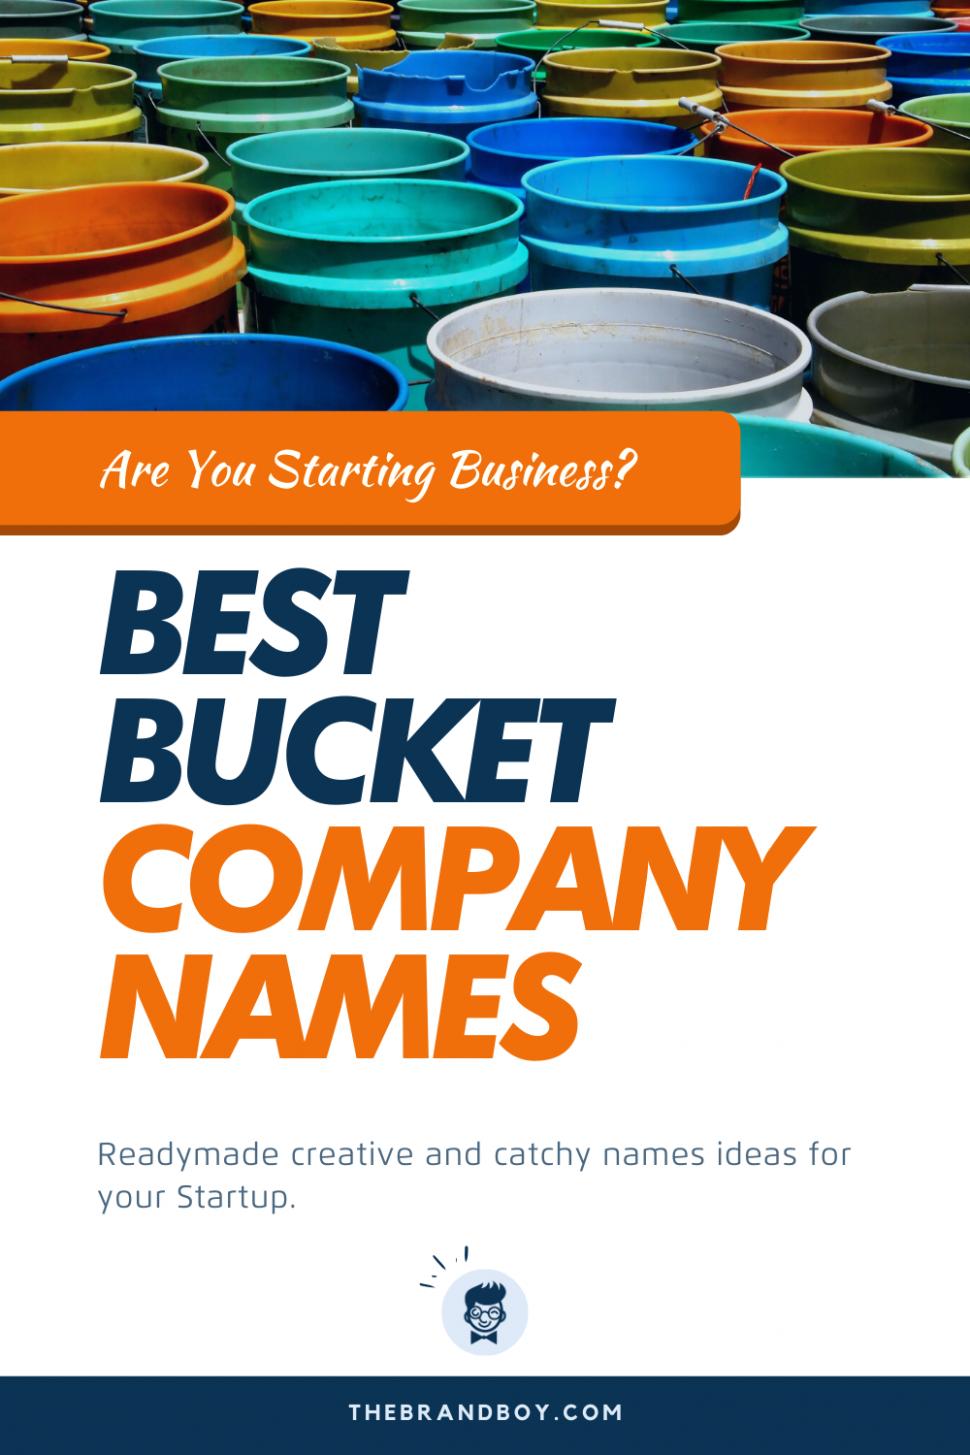 8+ Best Bucket Company Name Ideas - theBrandBoy